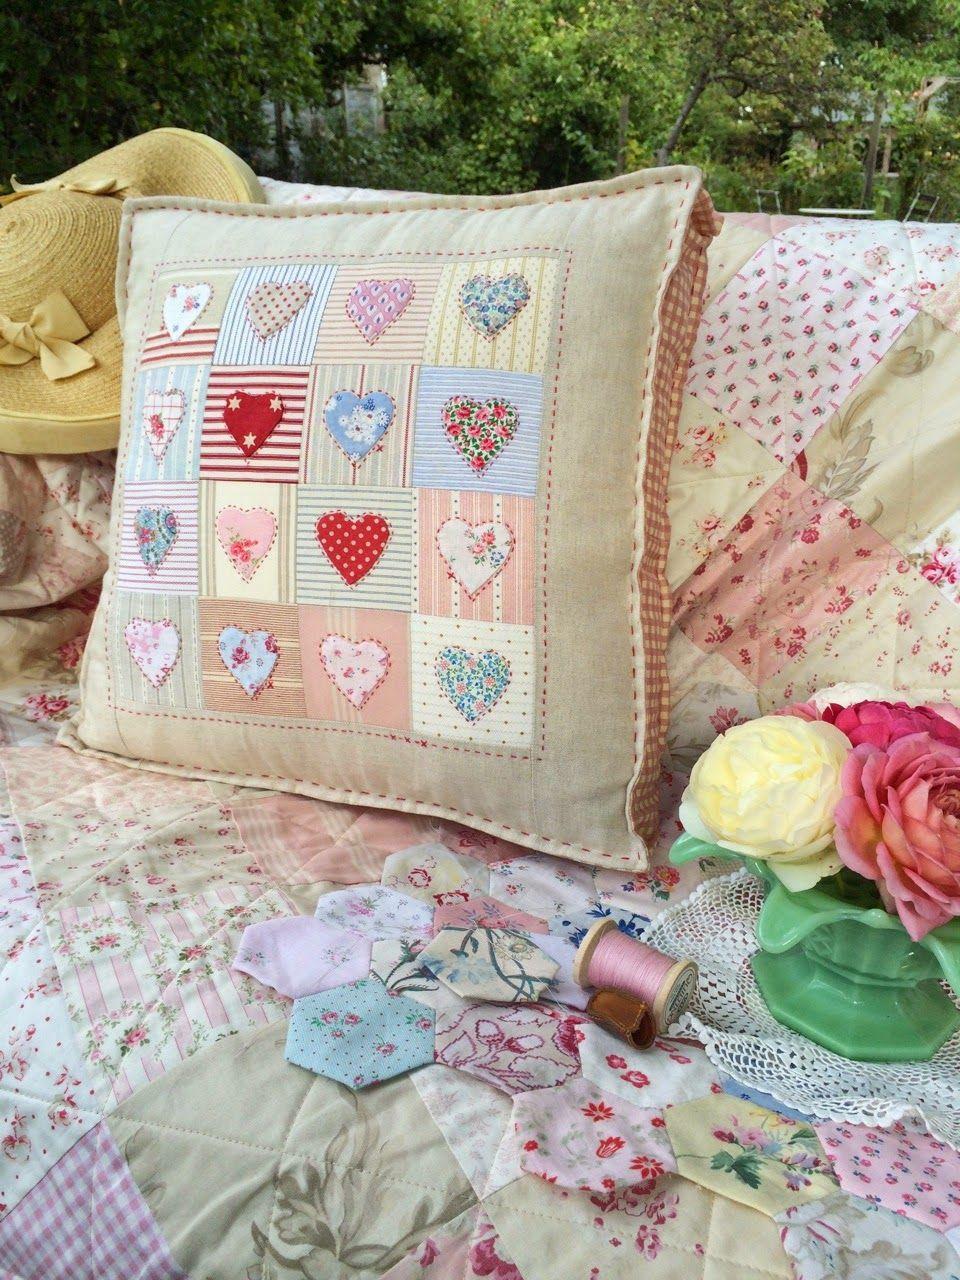 HenHouse  And They Call it Cushion Love  3354758cb0